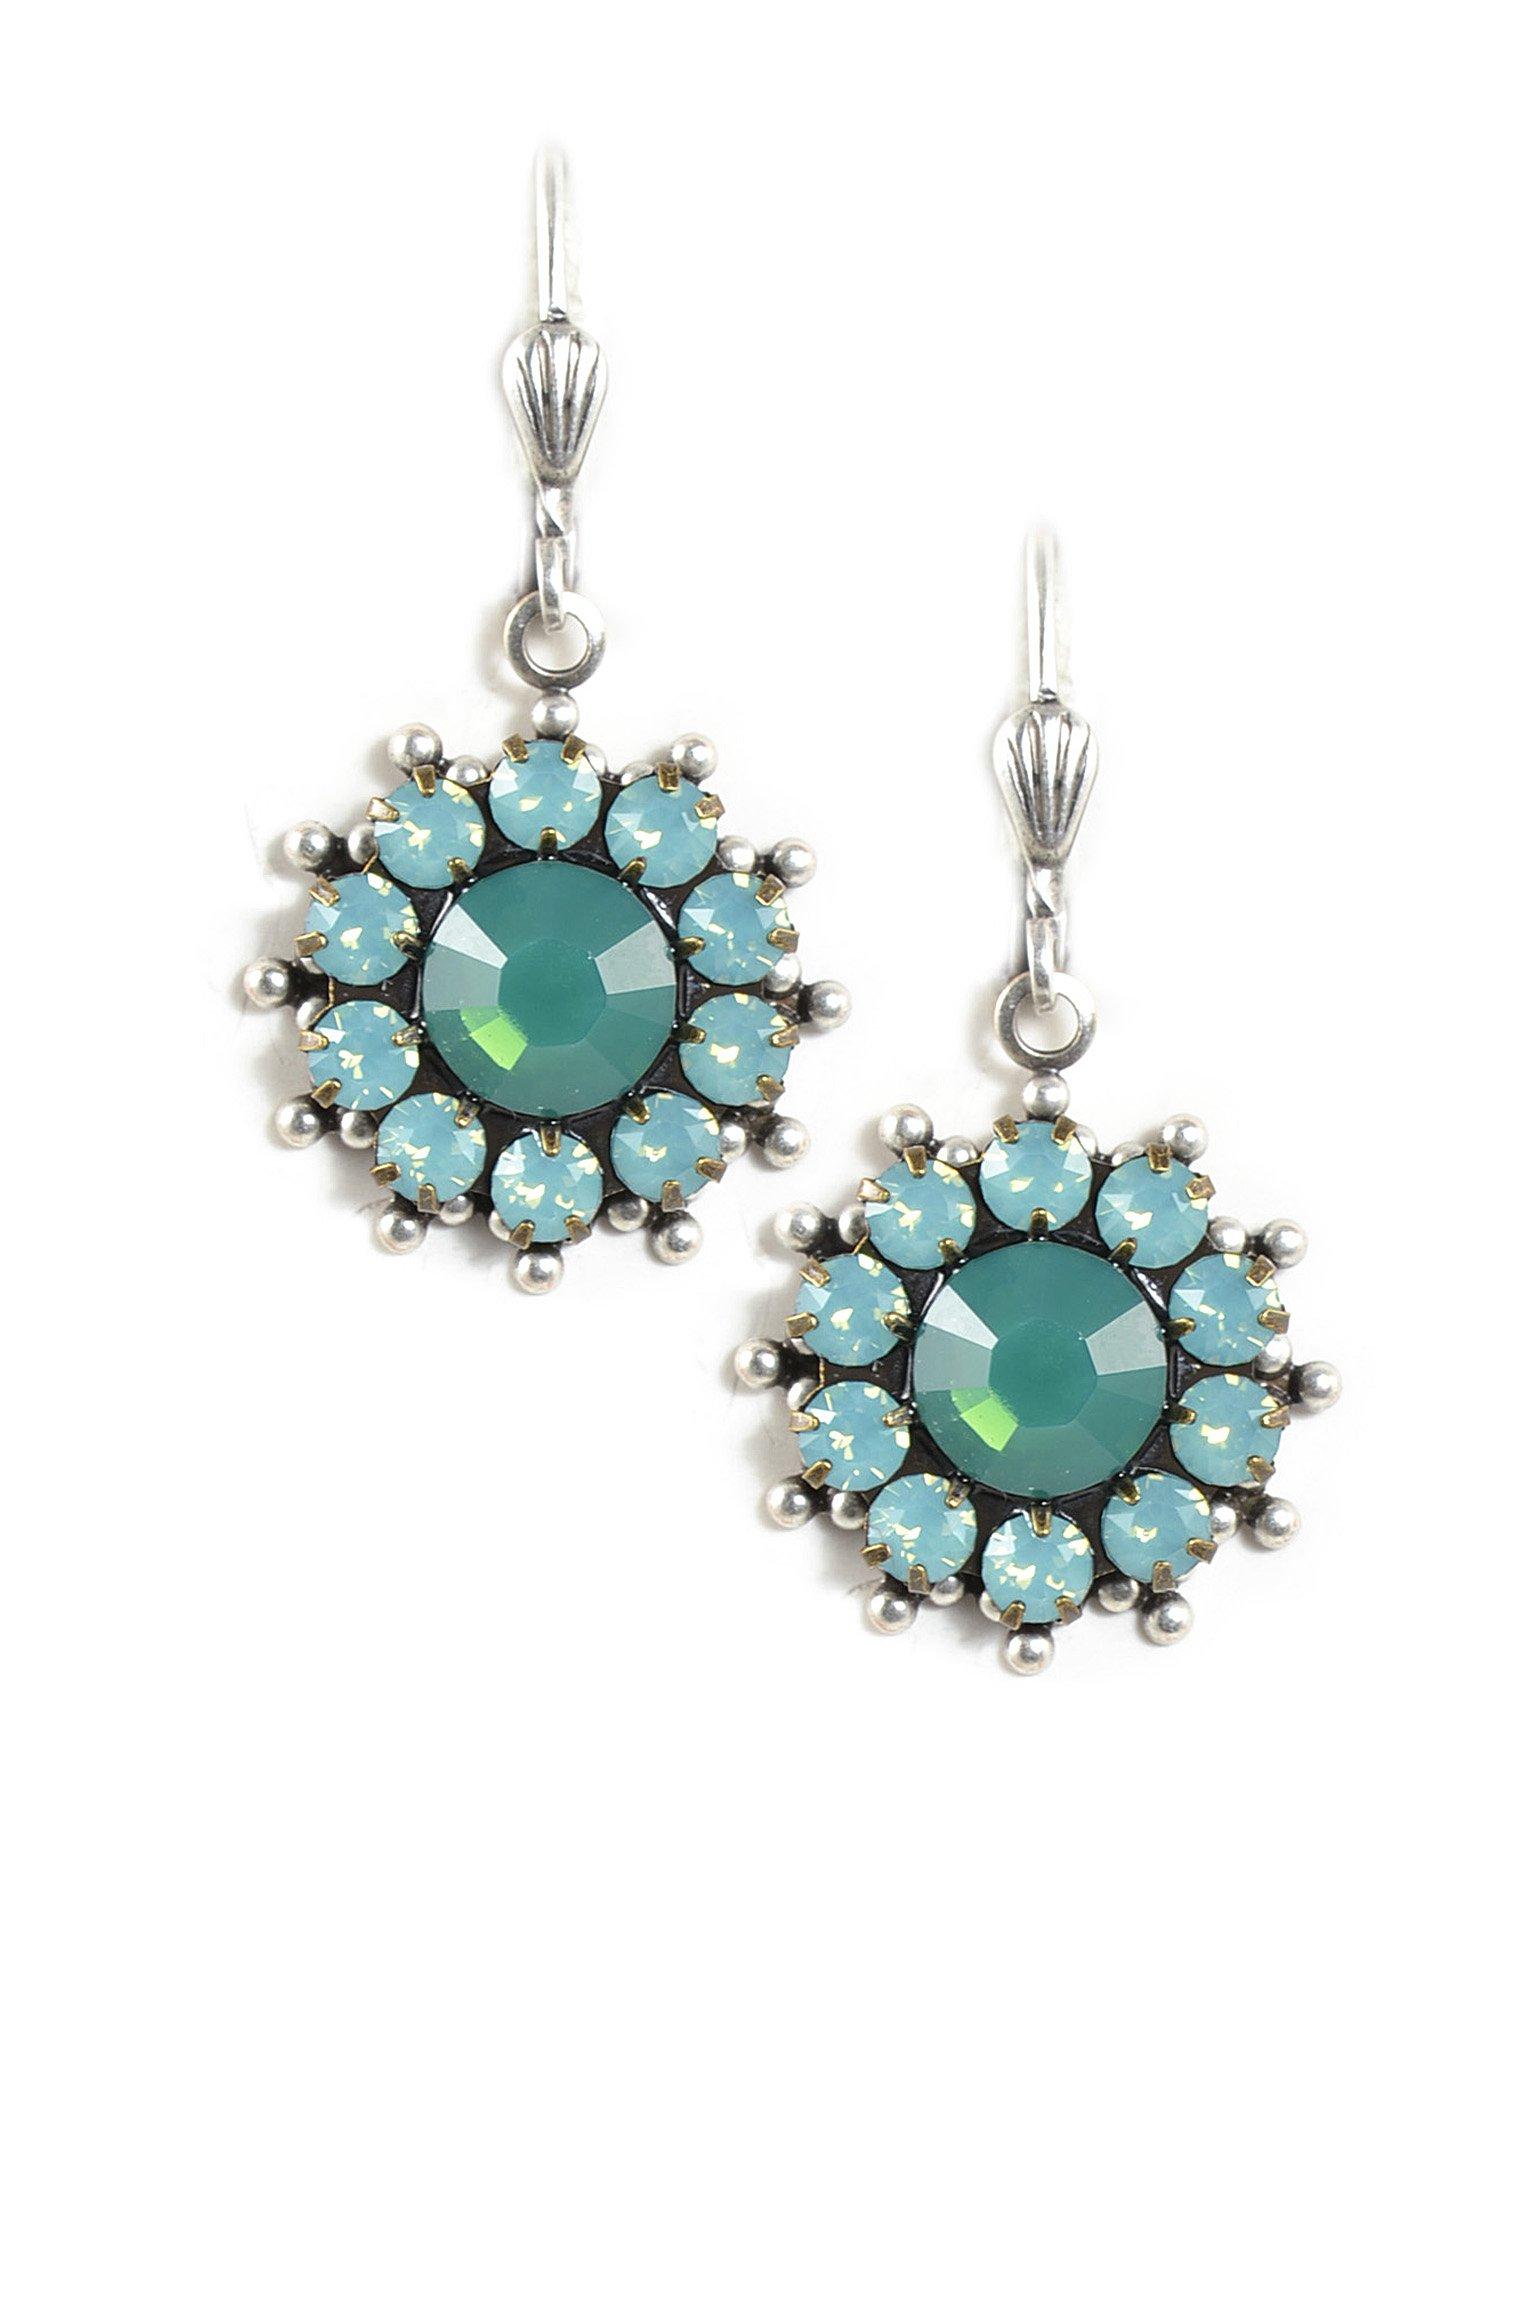 Clara Beau PalaceGreen color combo Swarovski Glass Crystal Round Silvertone Dangle Earrings E626 S-PlcGrn